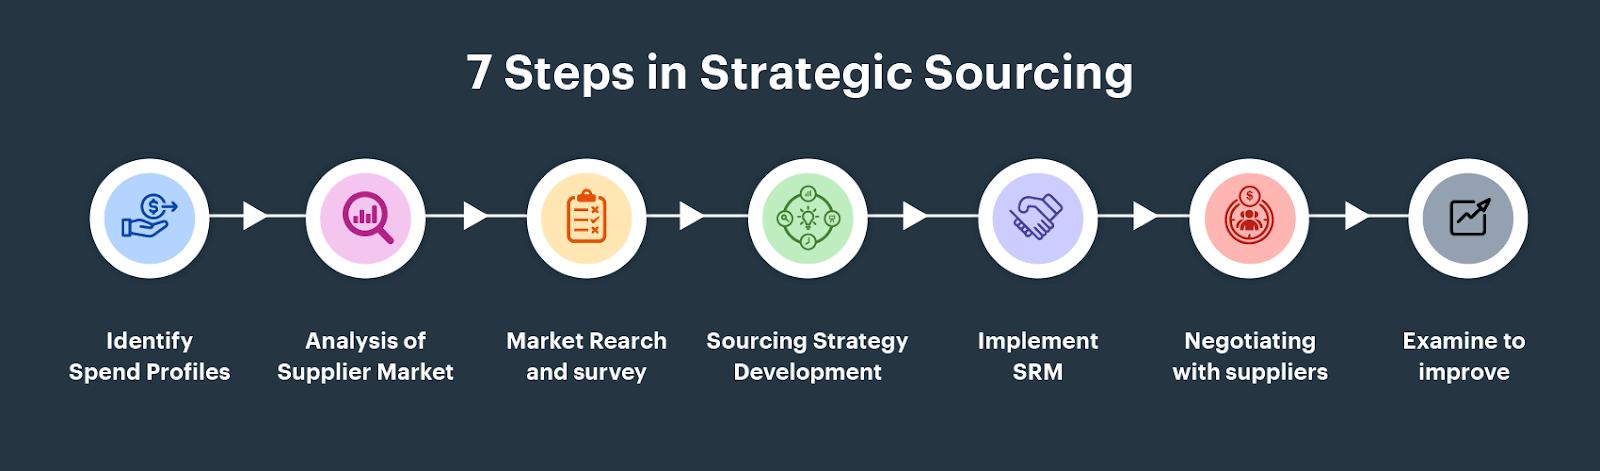 seven steps in strategic sourcing